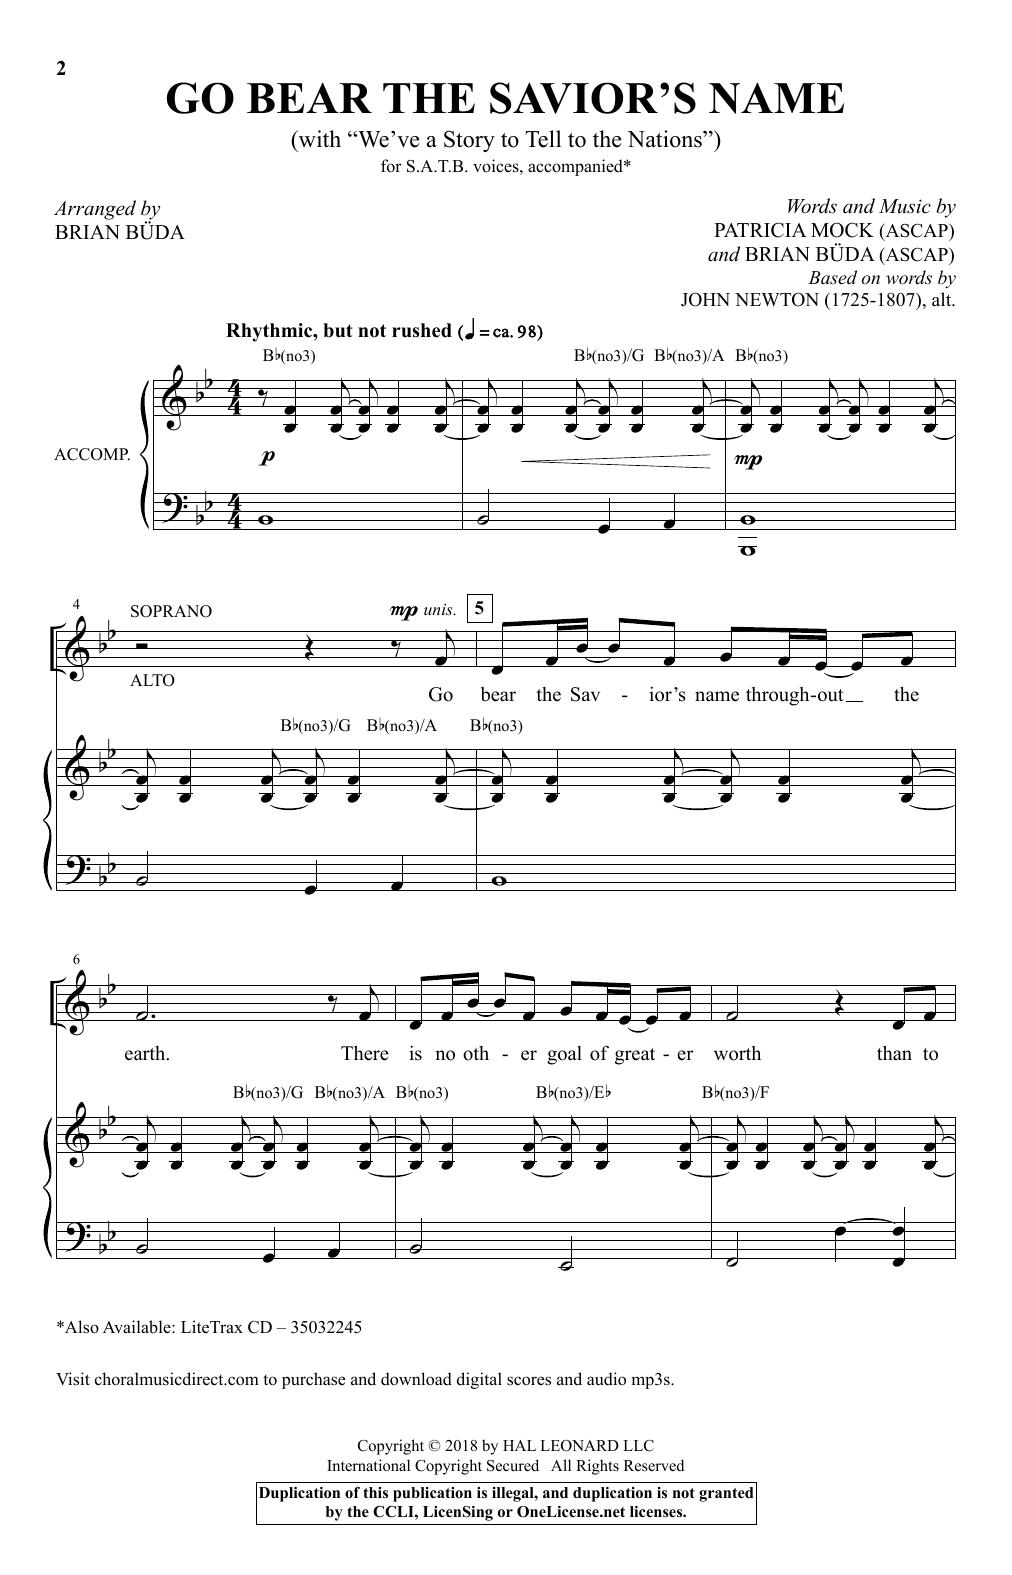 Go Bear The Savior's Name (With We've A Story To Tell) (arr. Brian Buda) (SATB Choir)